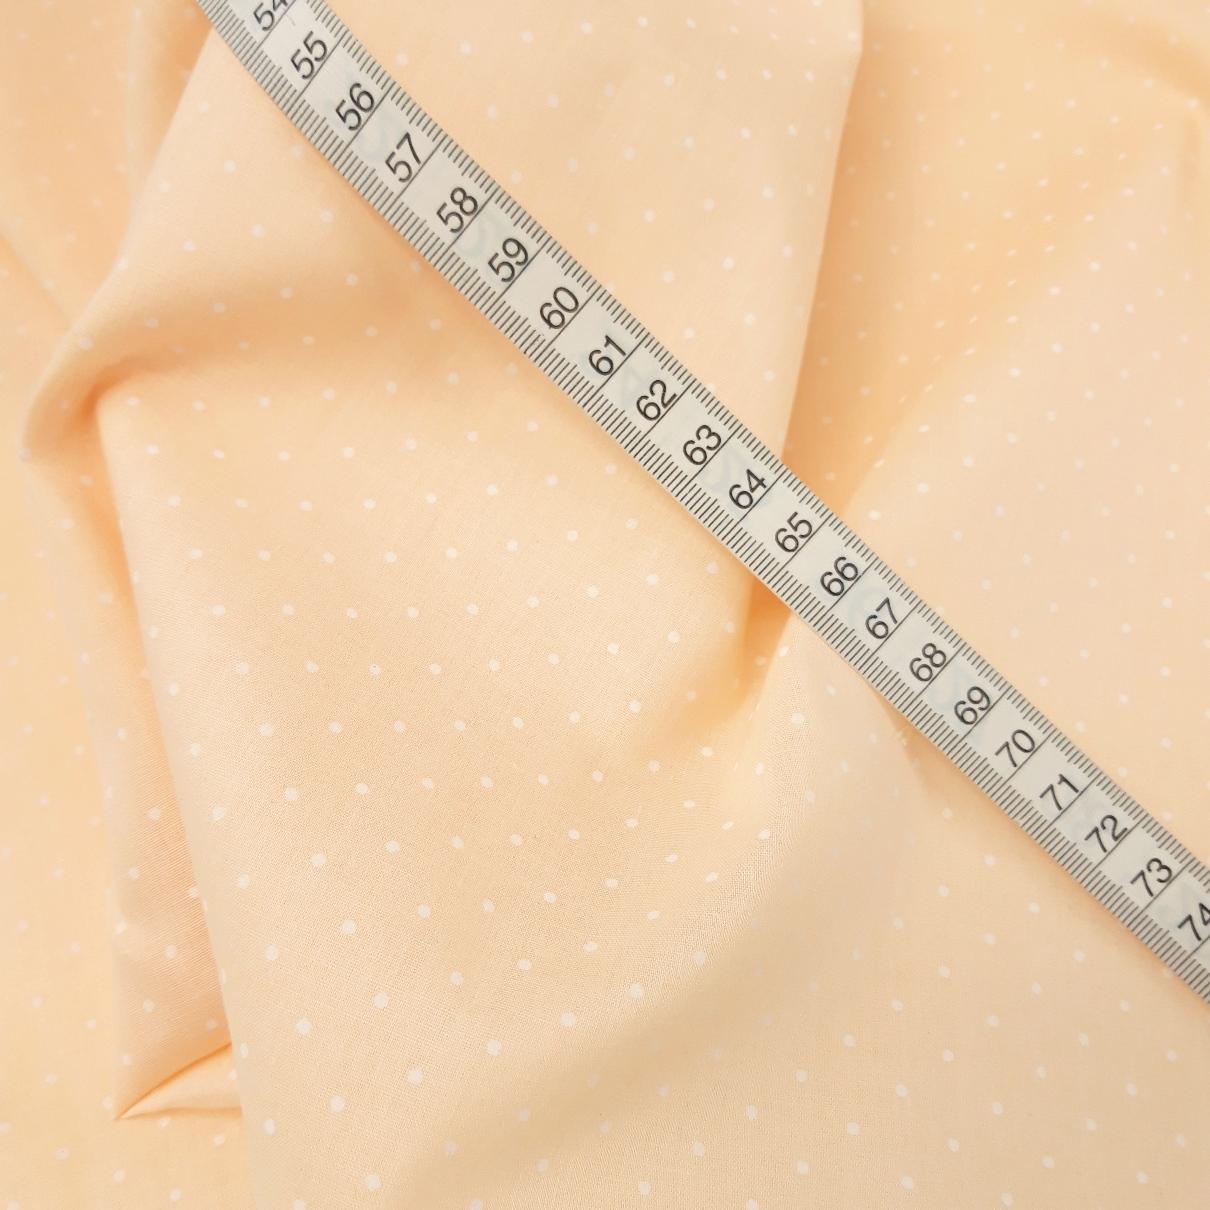 Dalston Mill Fabrics Polycotton Fabric Peach 1m